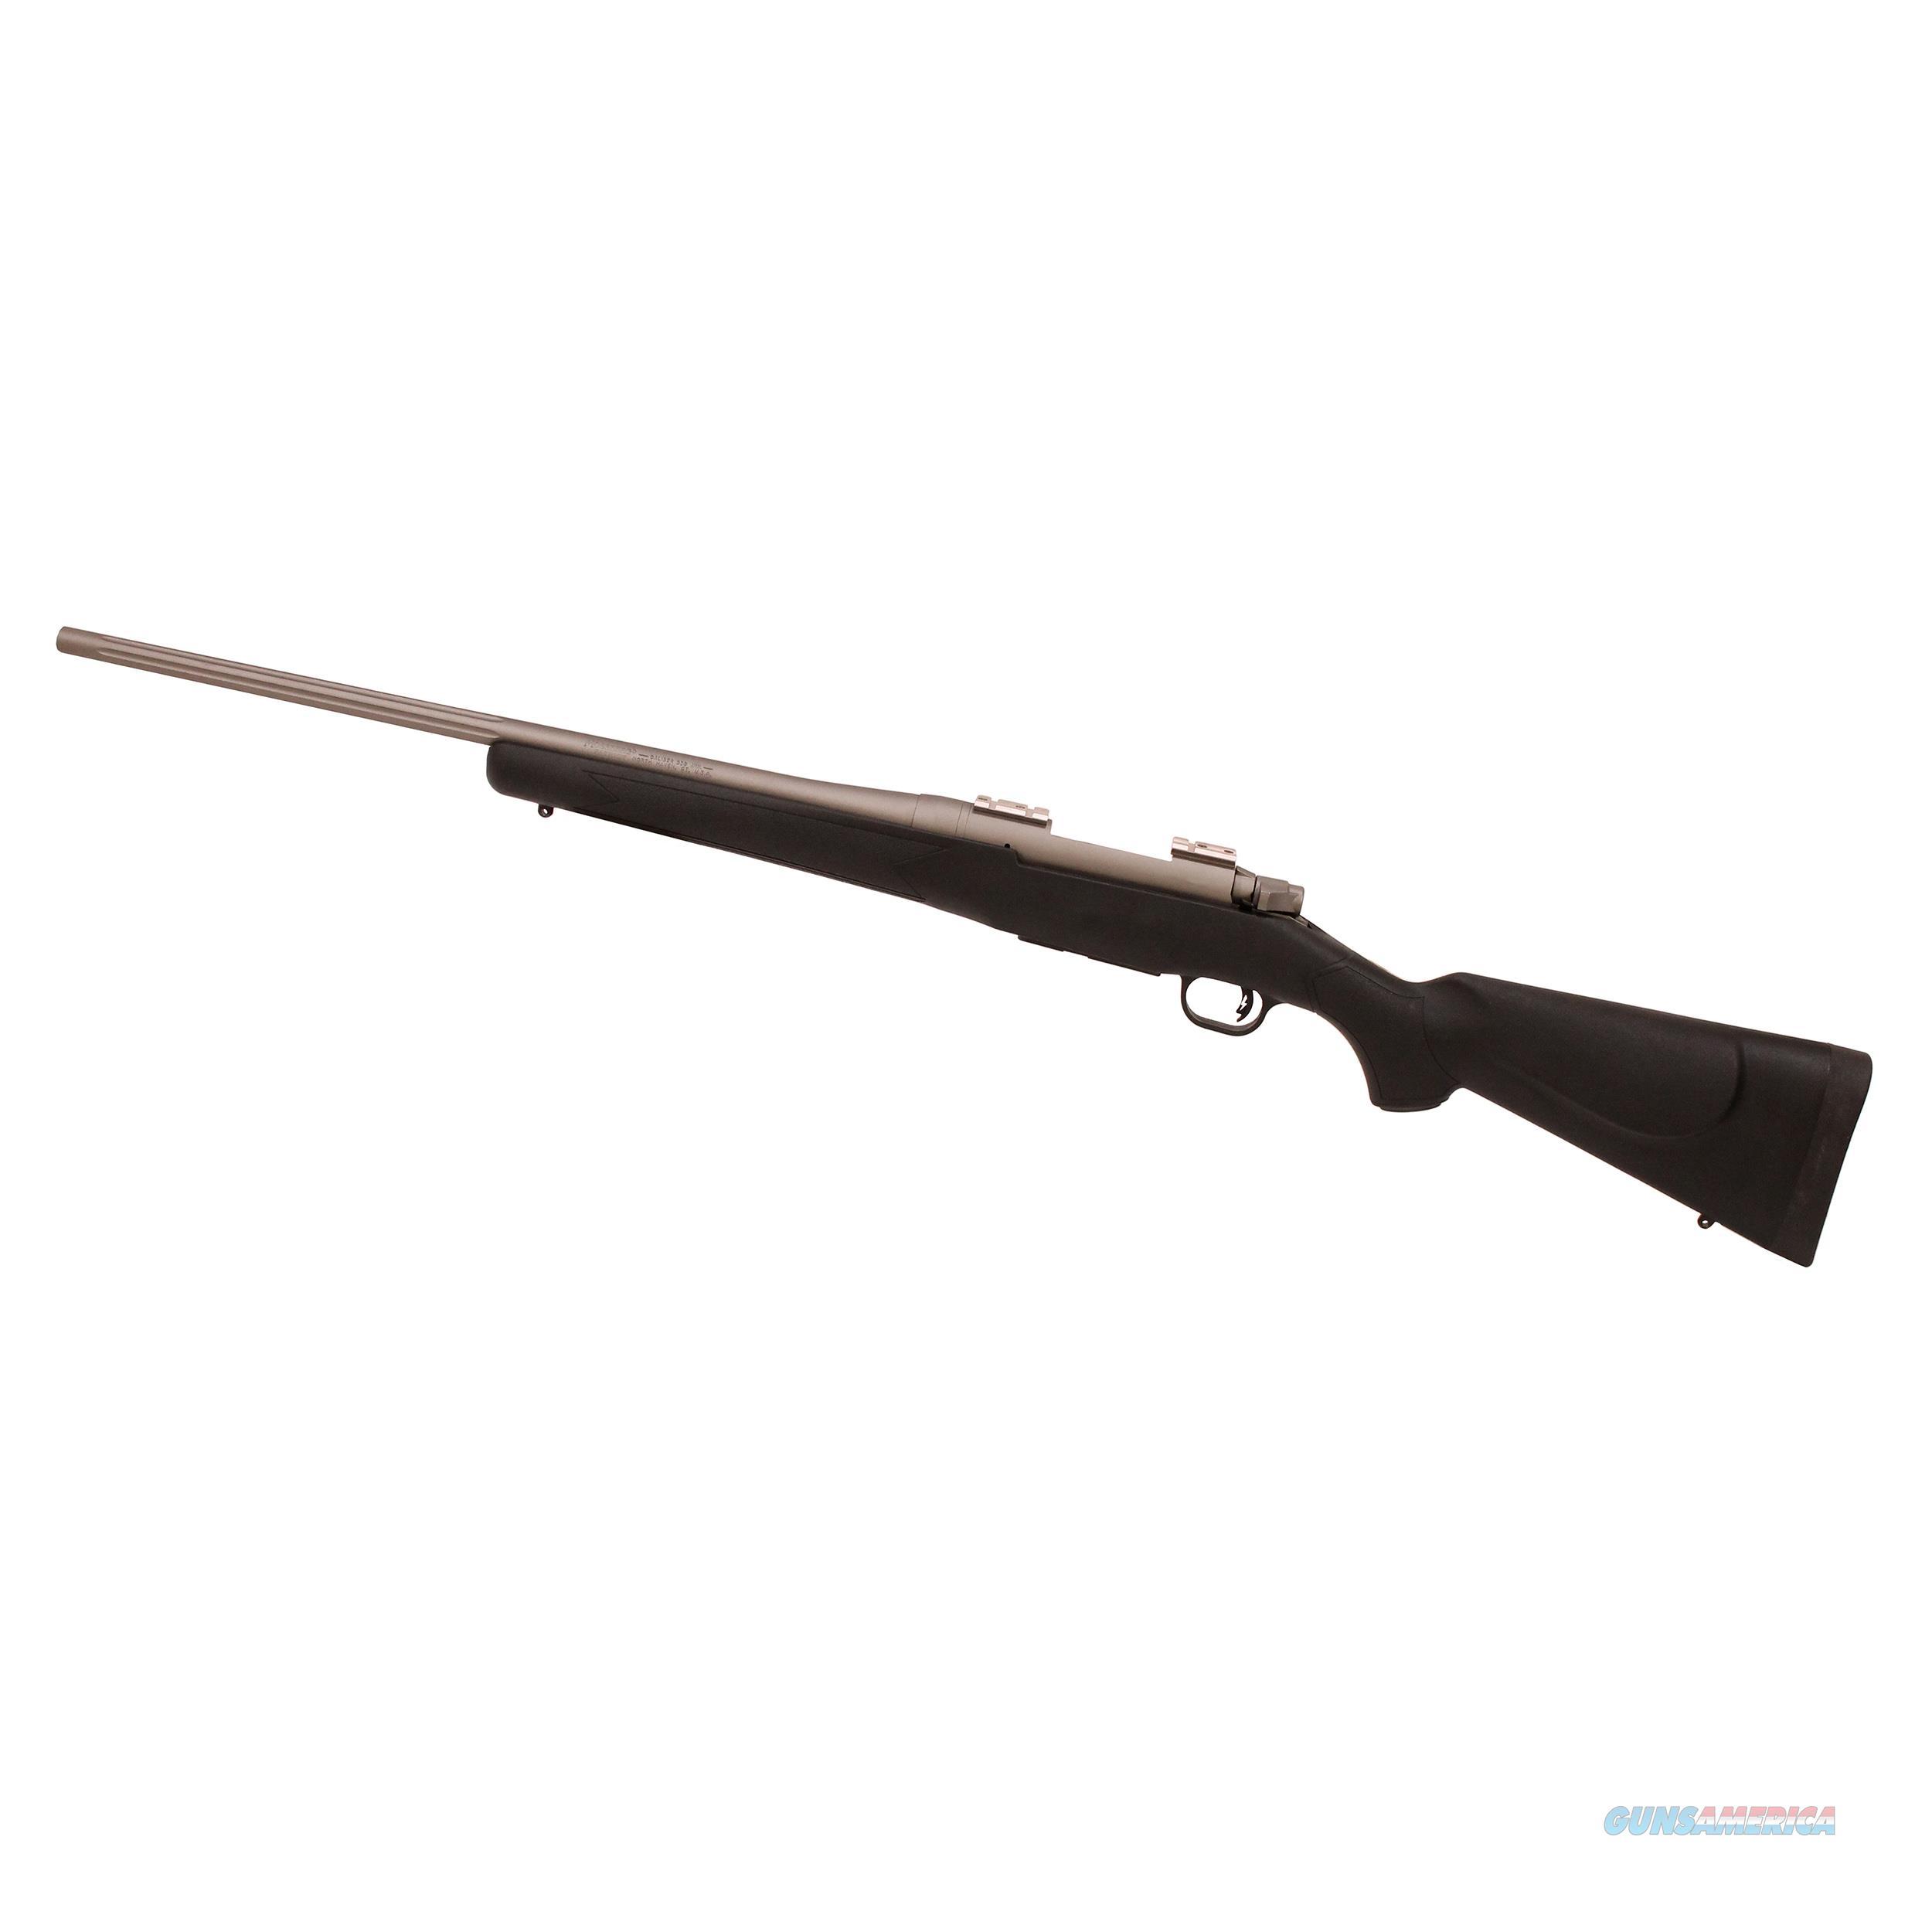 Mossberg Patriot Rifle 28007  Guns > Rifles > MN Misc Rifles